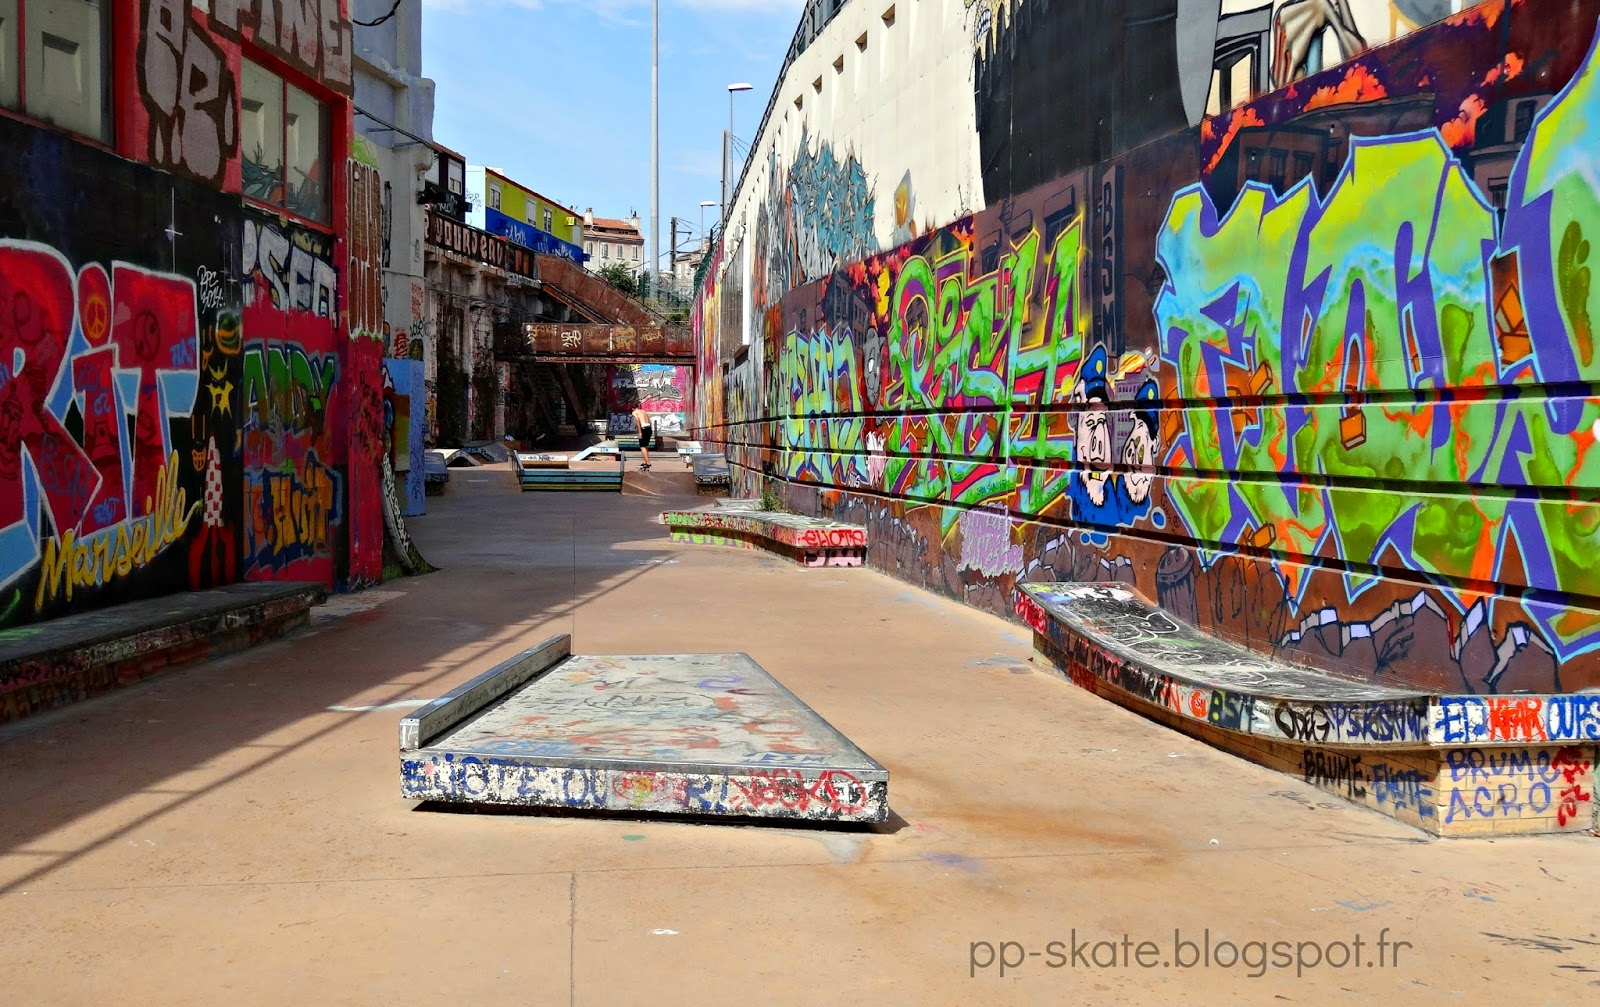 le skatepark de la friche belle de mai   u00e0 marseille